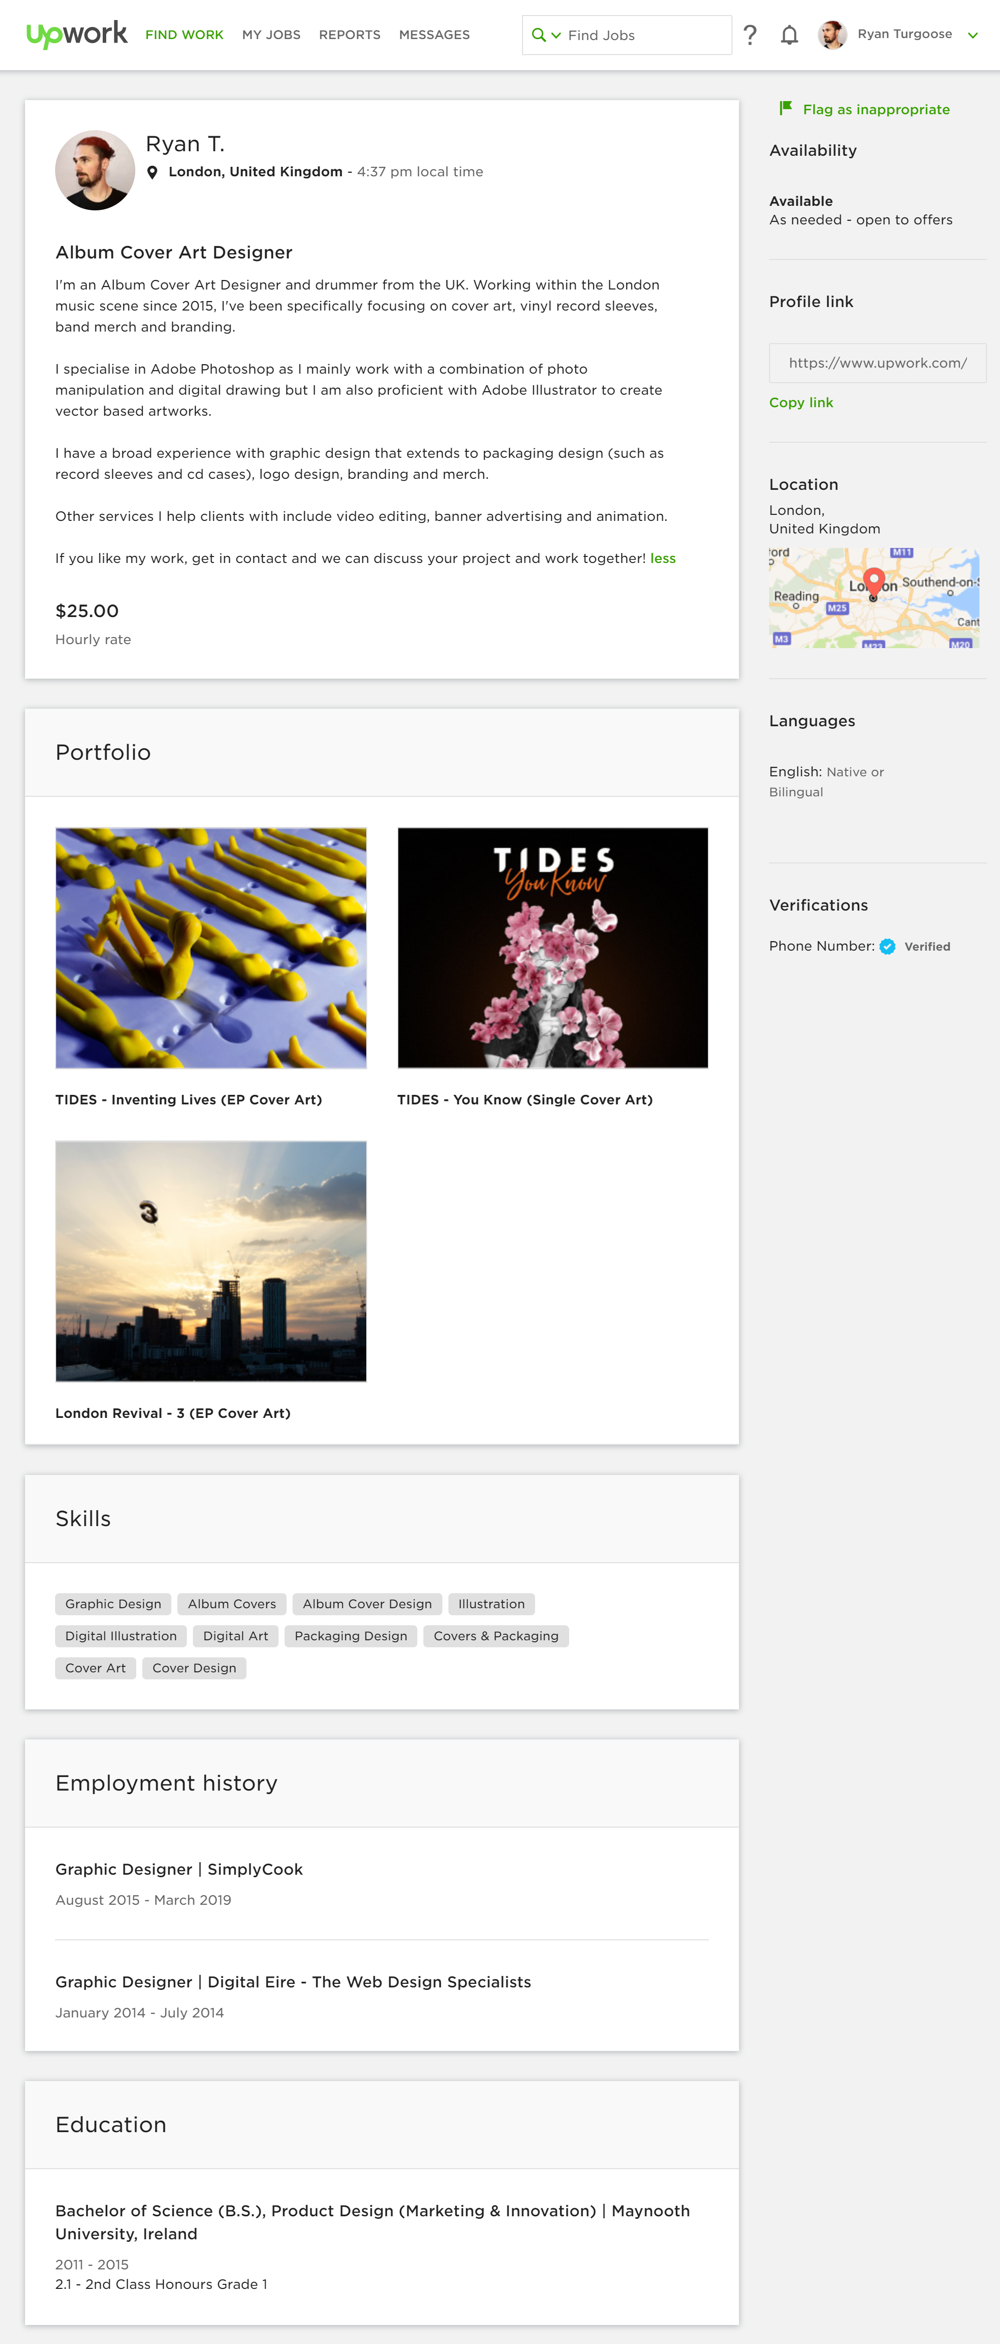 Upwork Profile - Ryan Turgoose - image 1 - student project